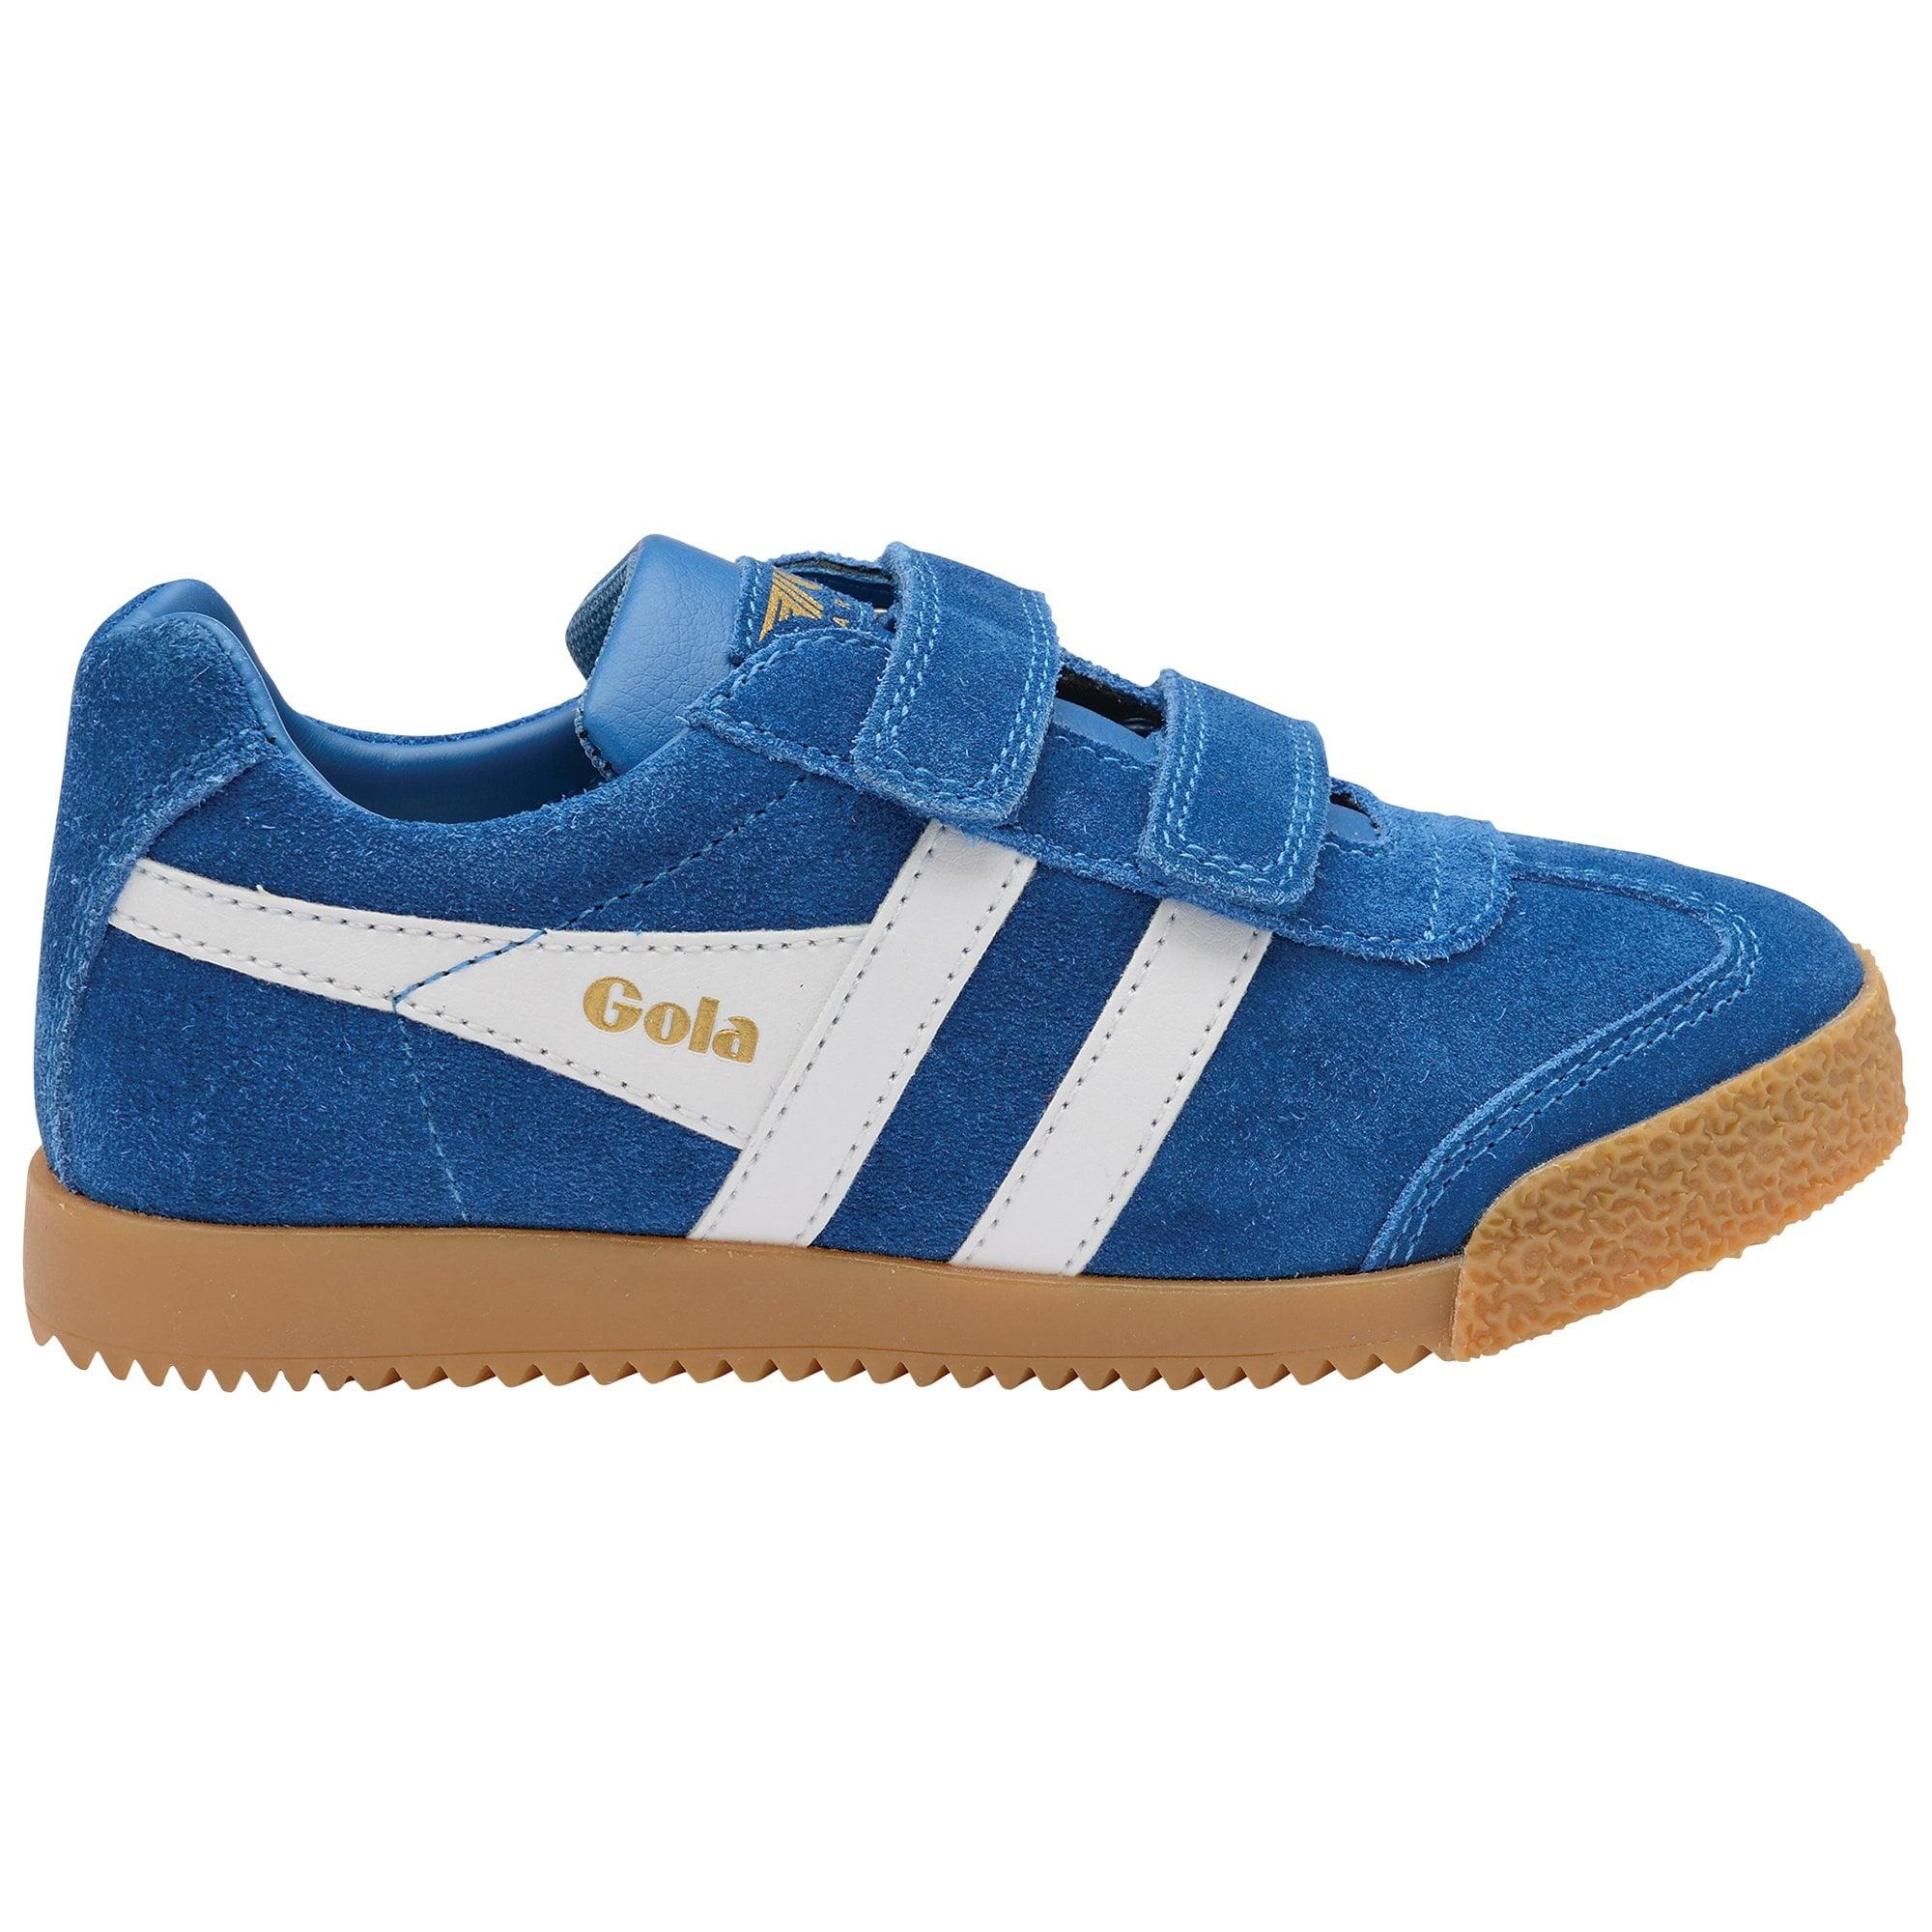 Buy Gola kids Harrier strap sneakers